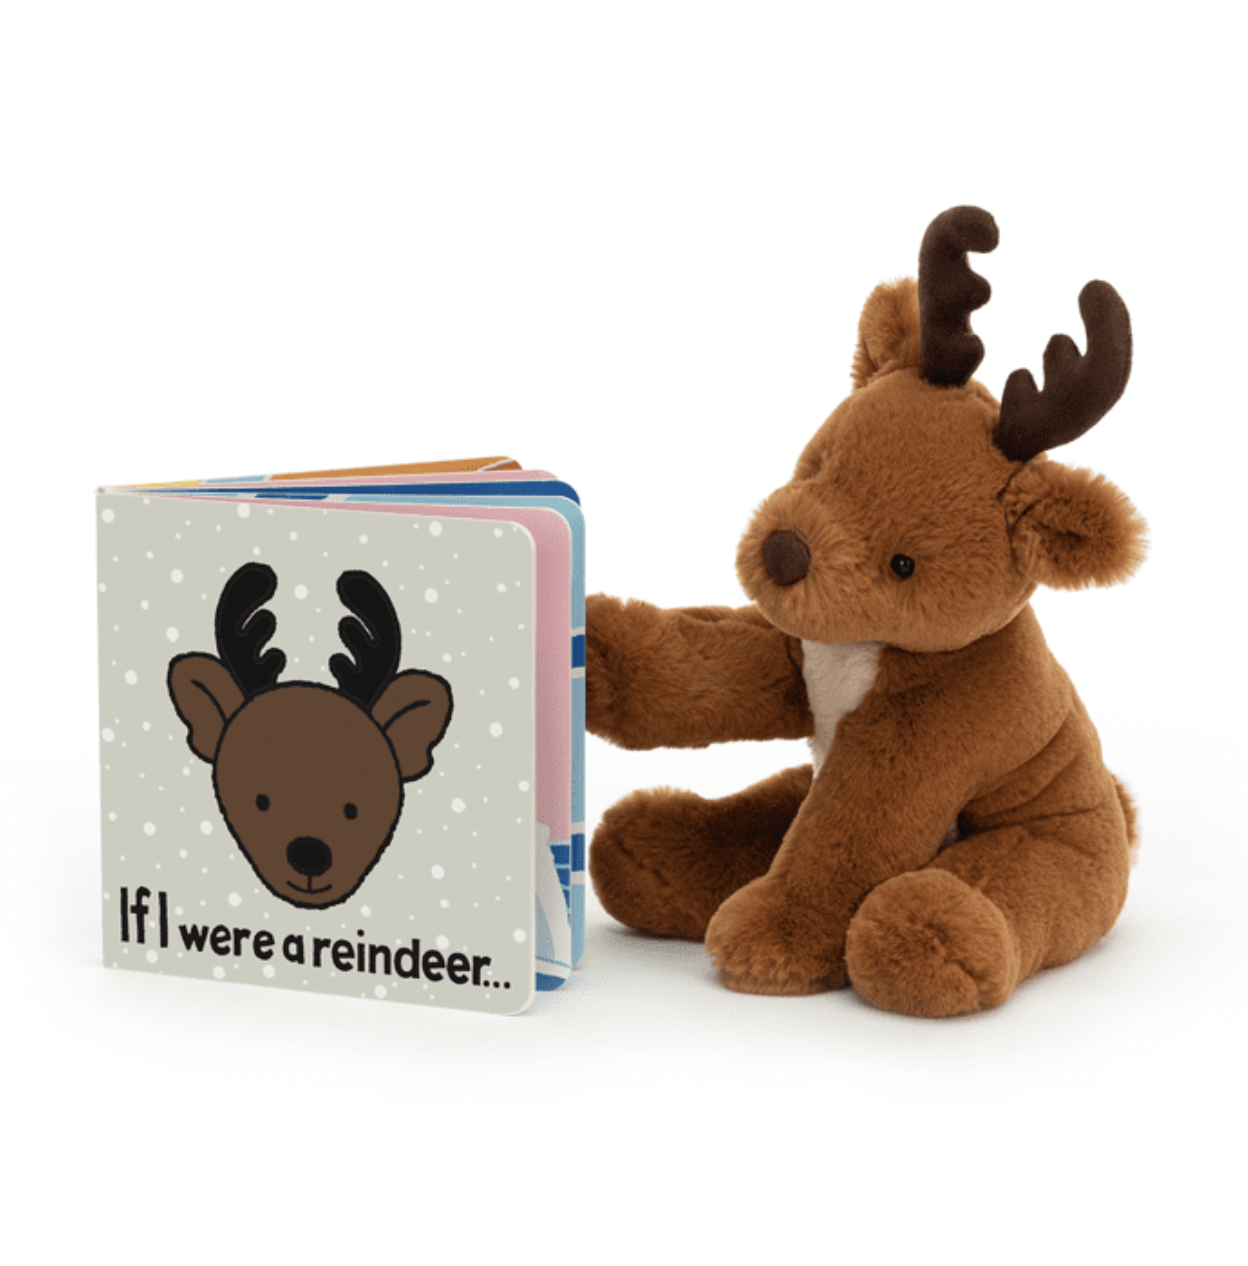 Jellycat If I Were a Reindeer Book BB444RR